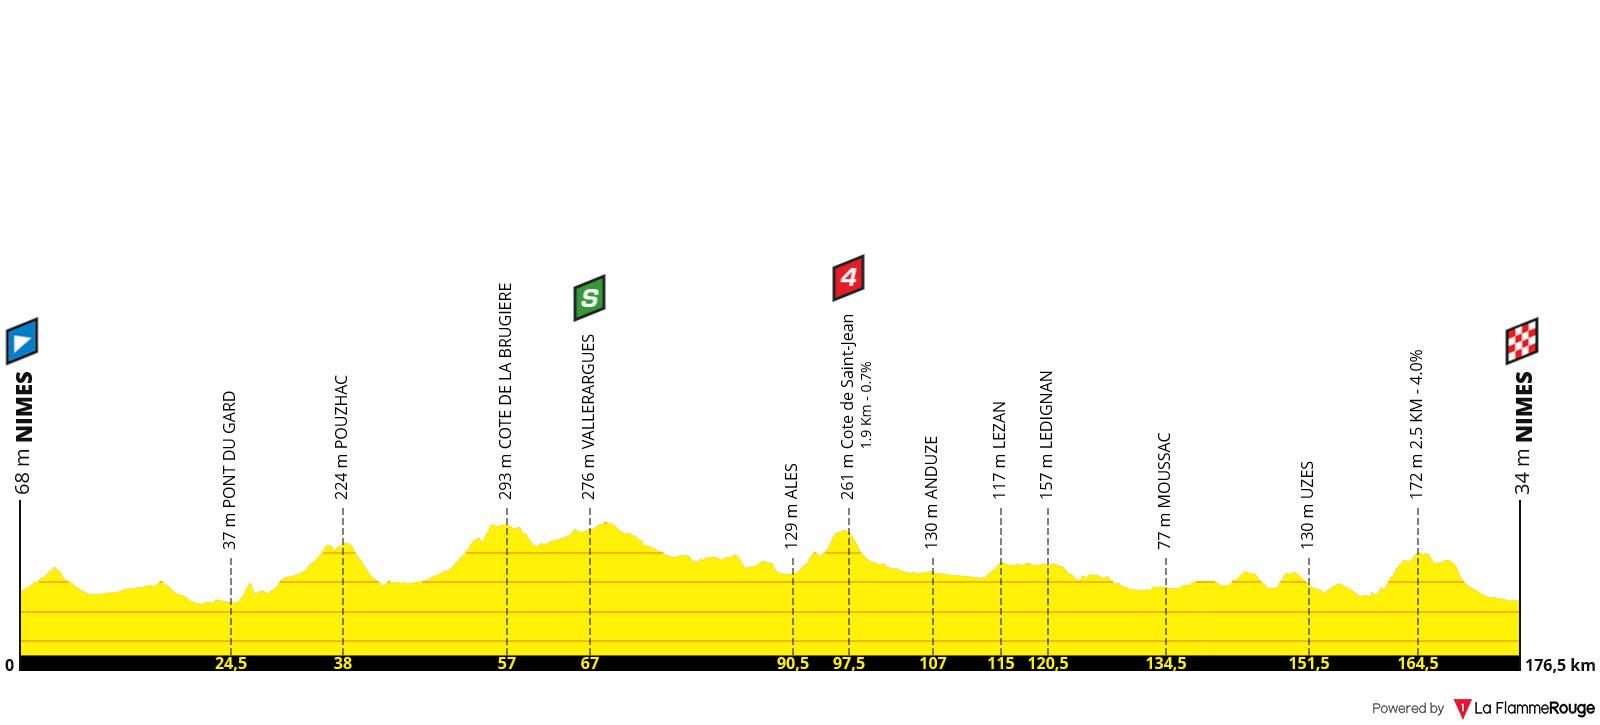 Perfil Etapa 16 - Tour de Francia 2019